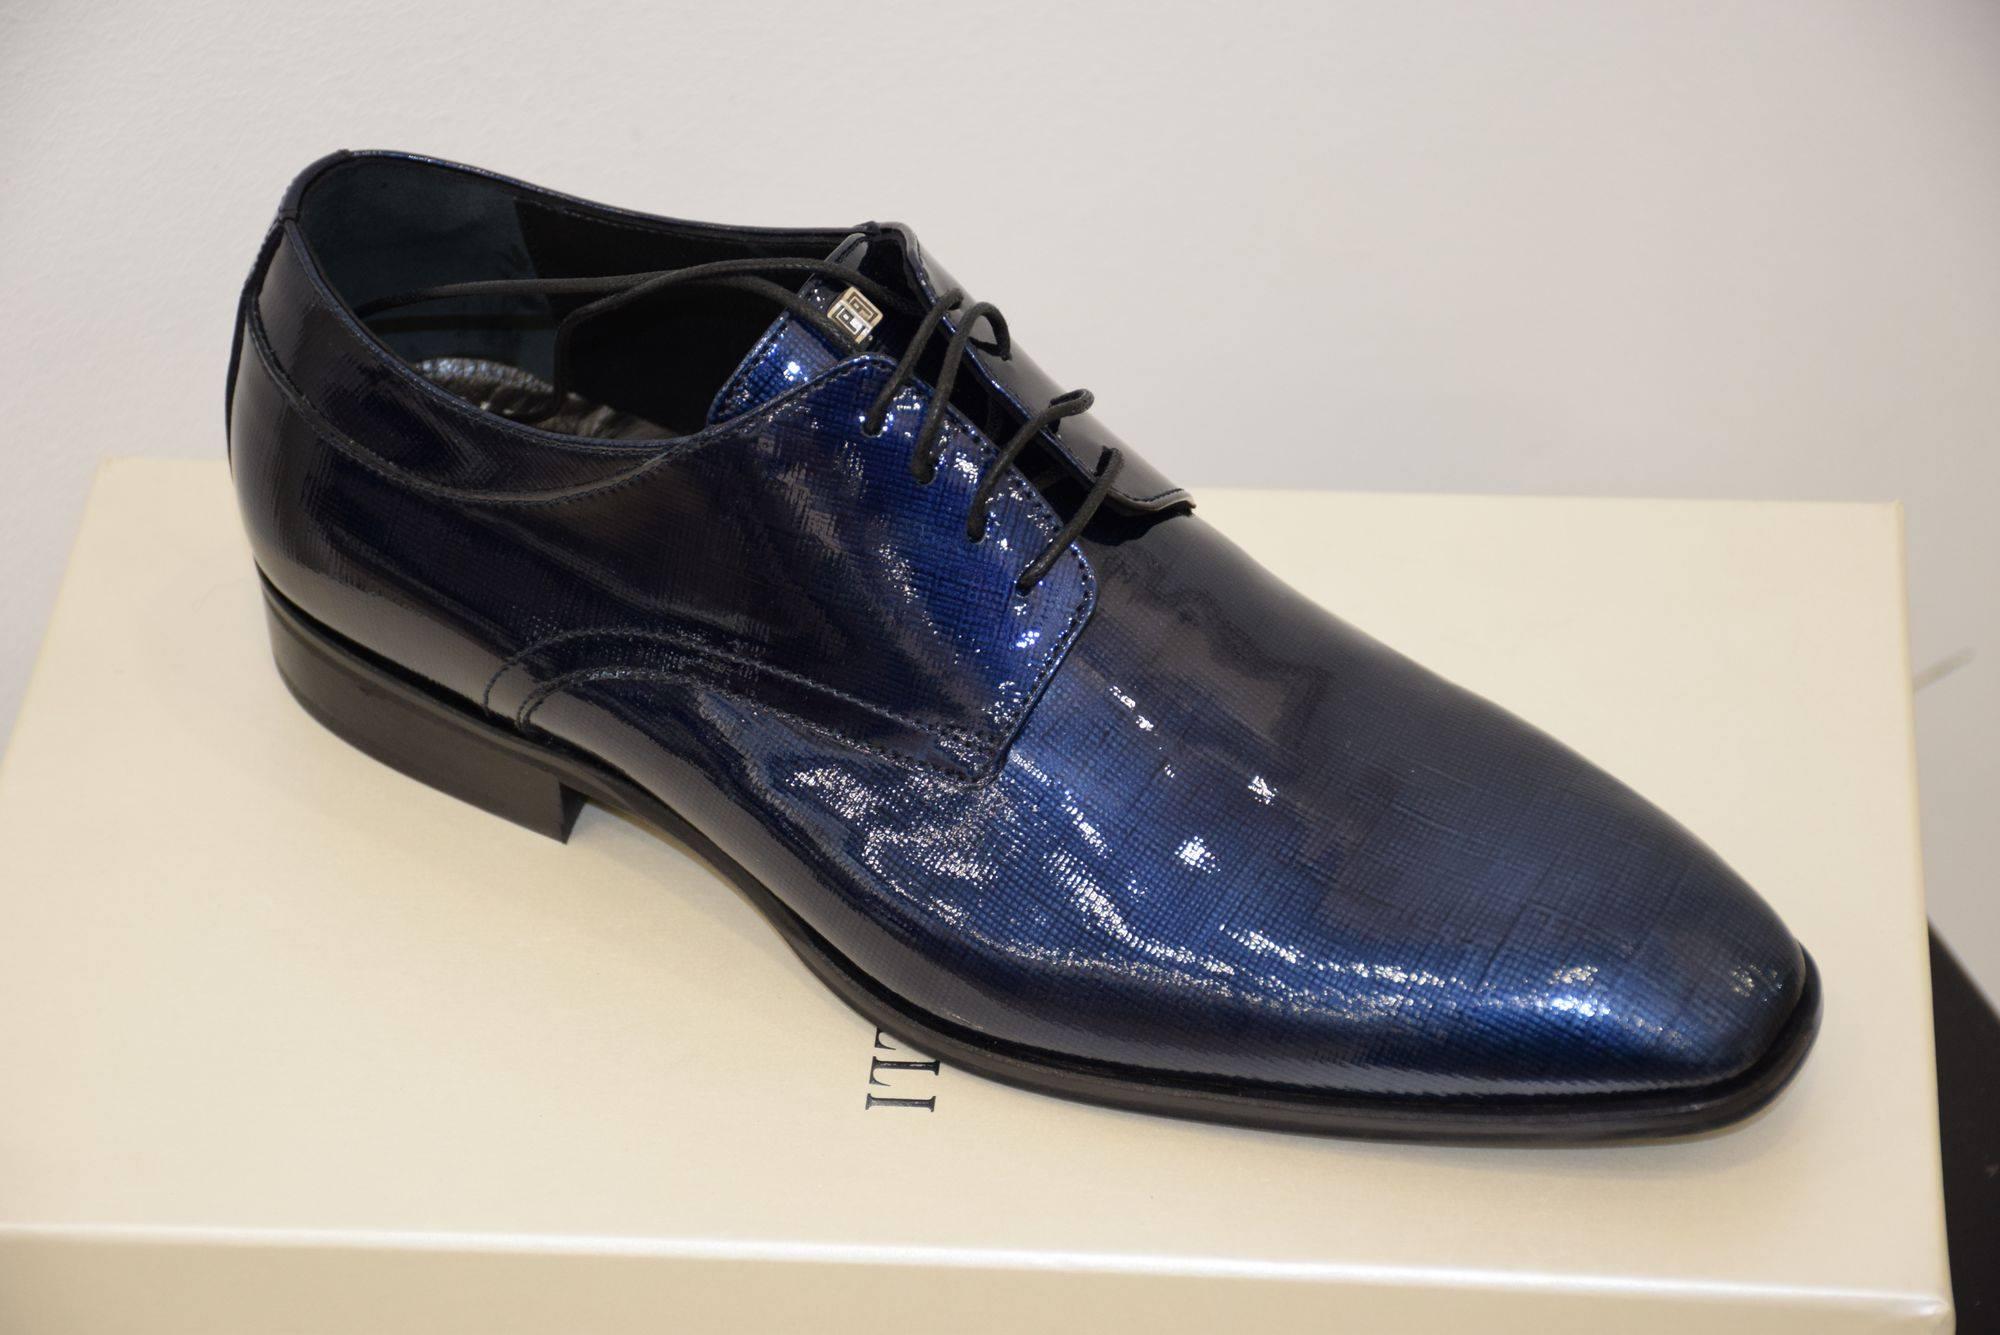 online store e667b bb985 Scarpe Cerimonia Uomo 'Carlo Pignatelli 2017' - Mabitusposi ...